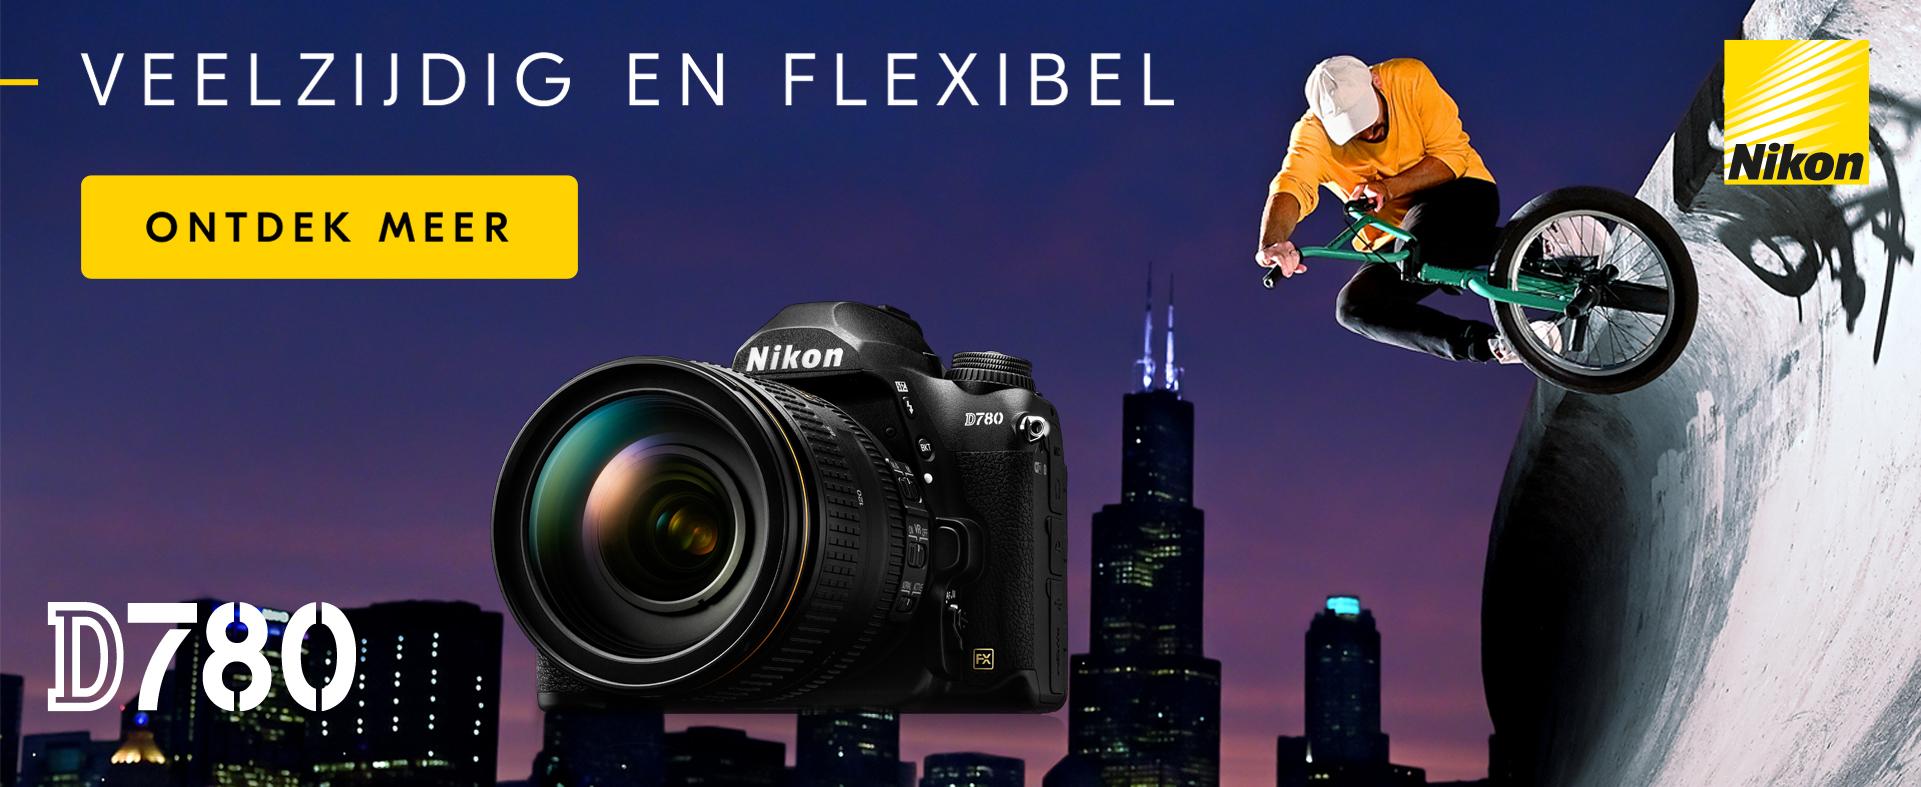 Nikon D780 banner website.jpg